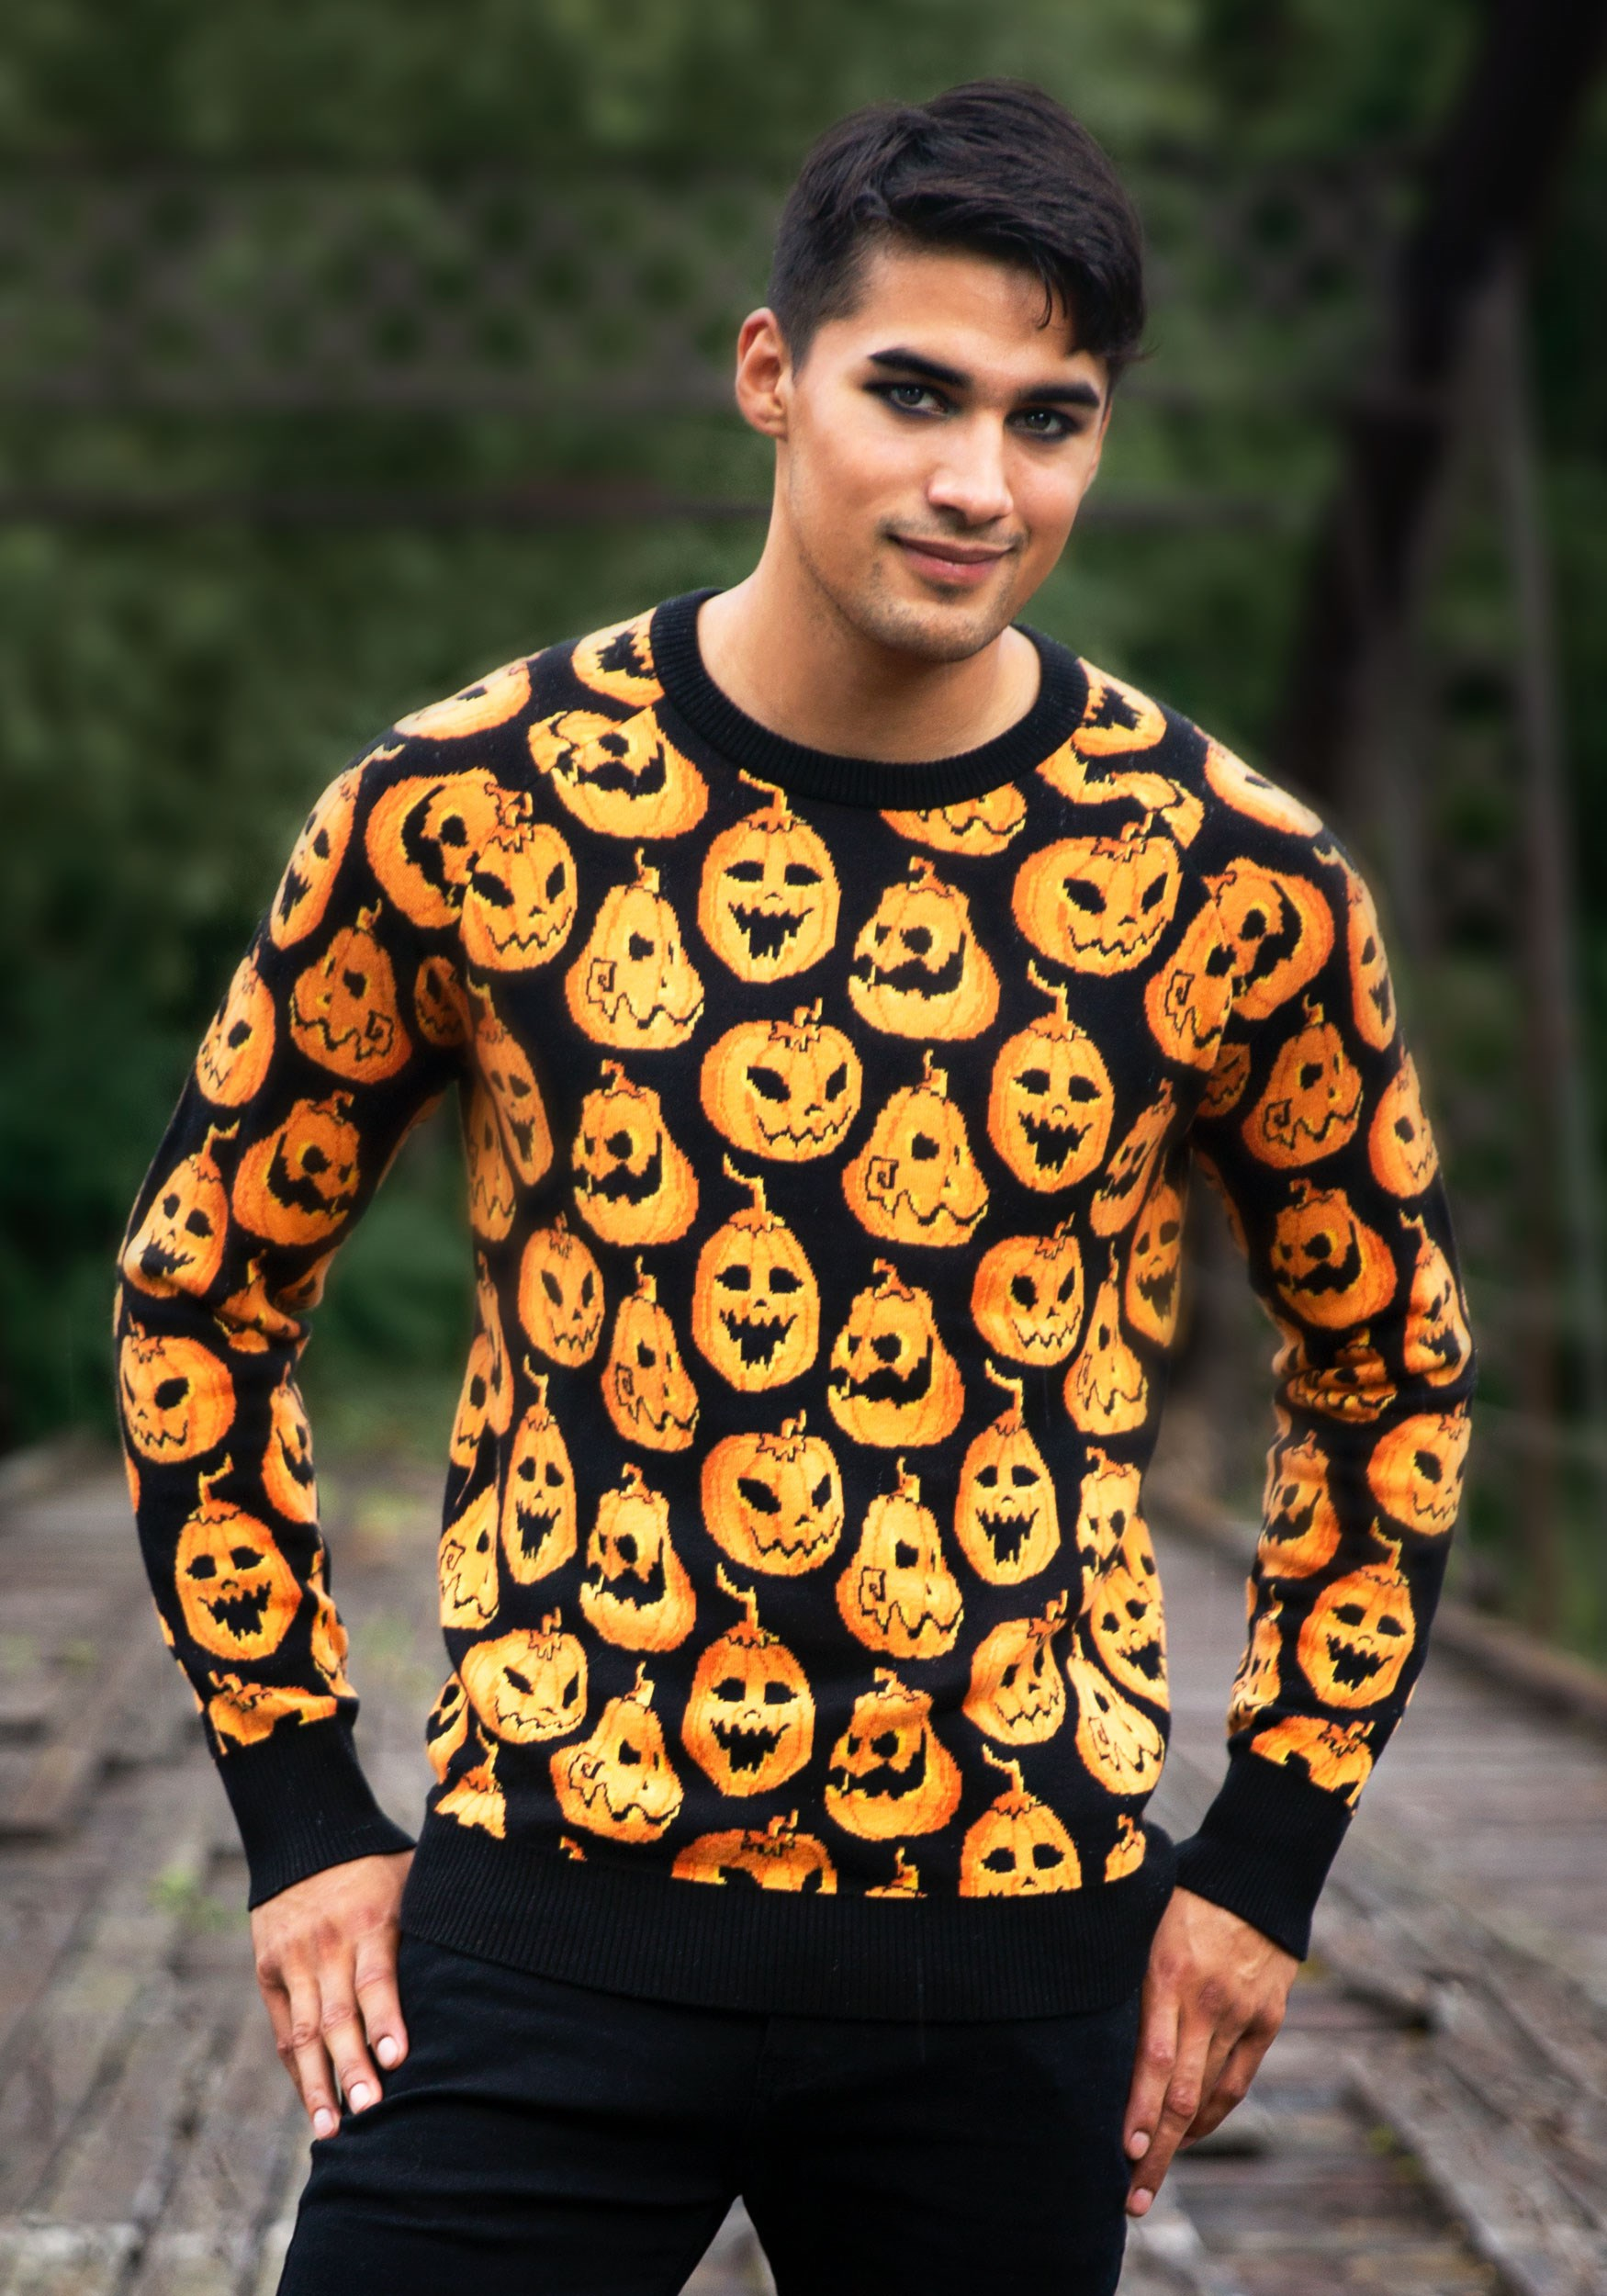 Pumpkin Frenzy Halloween Sweater